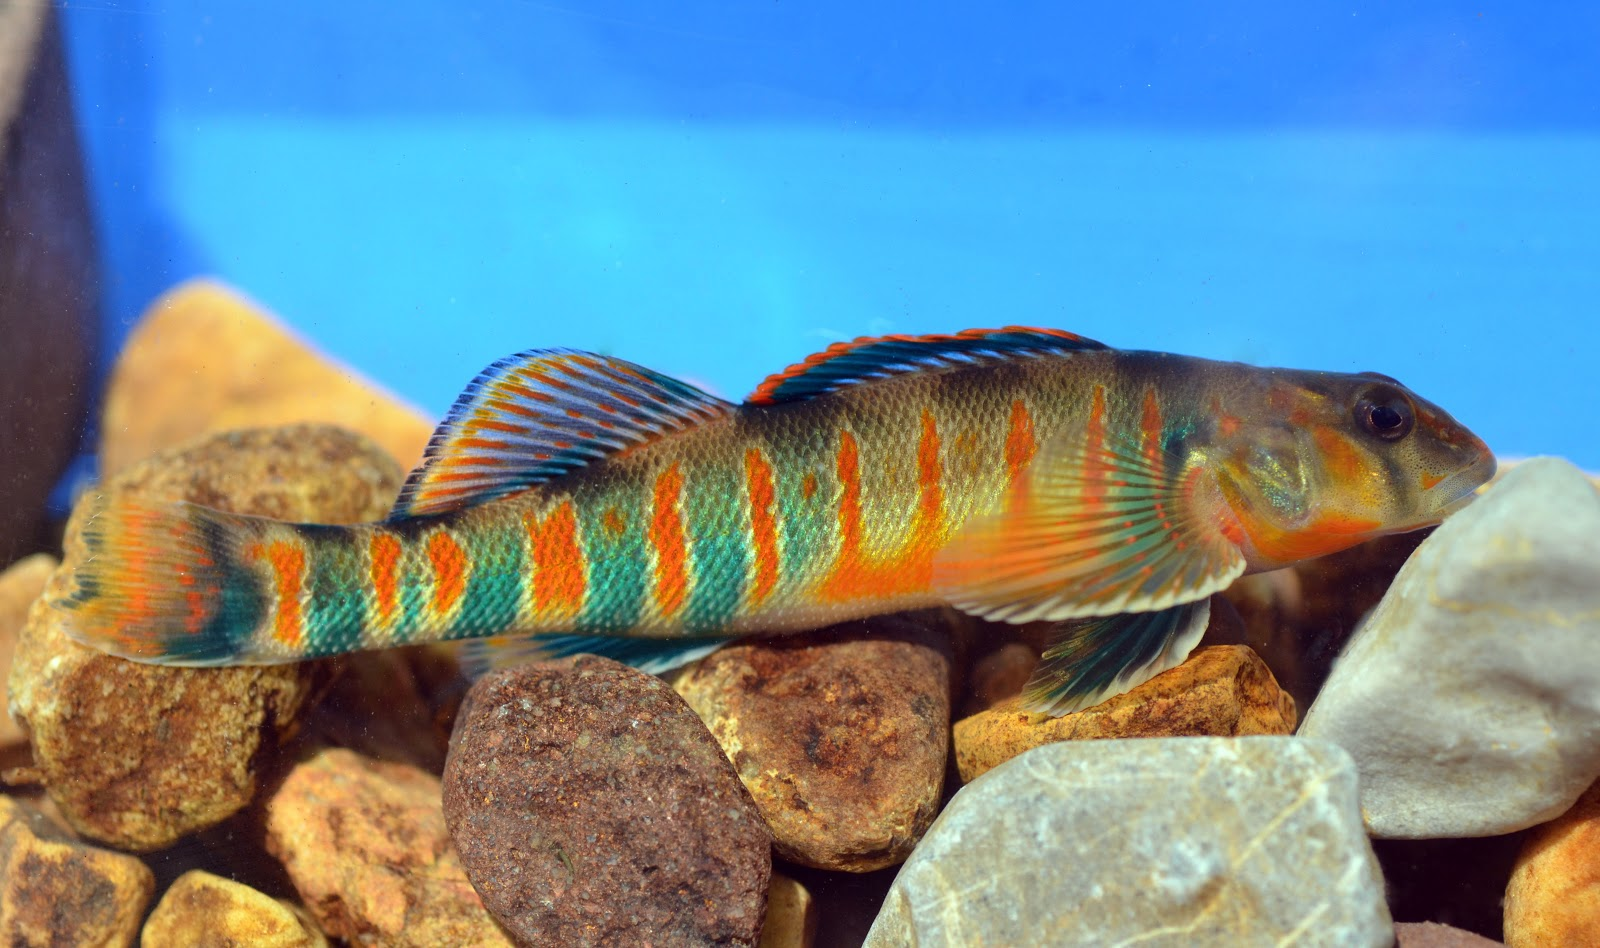 Virginia Fishes: Candy darters (Etheostoma osburni) in Big Stony Creek